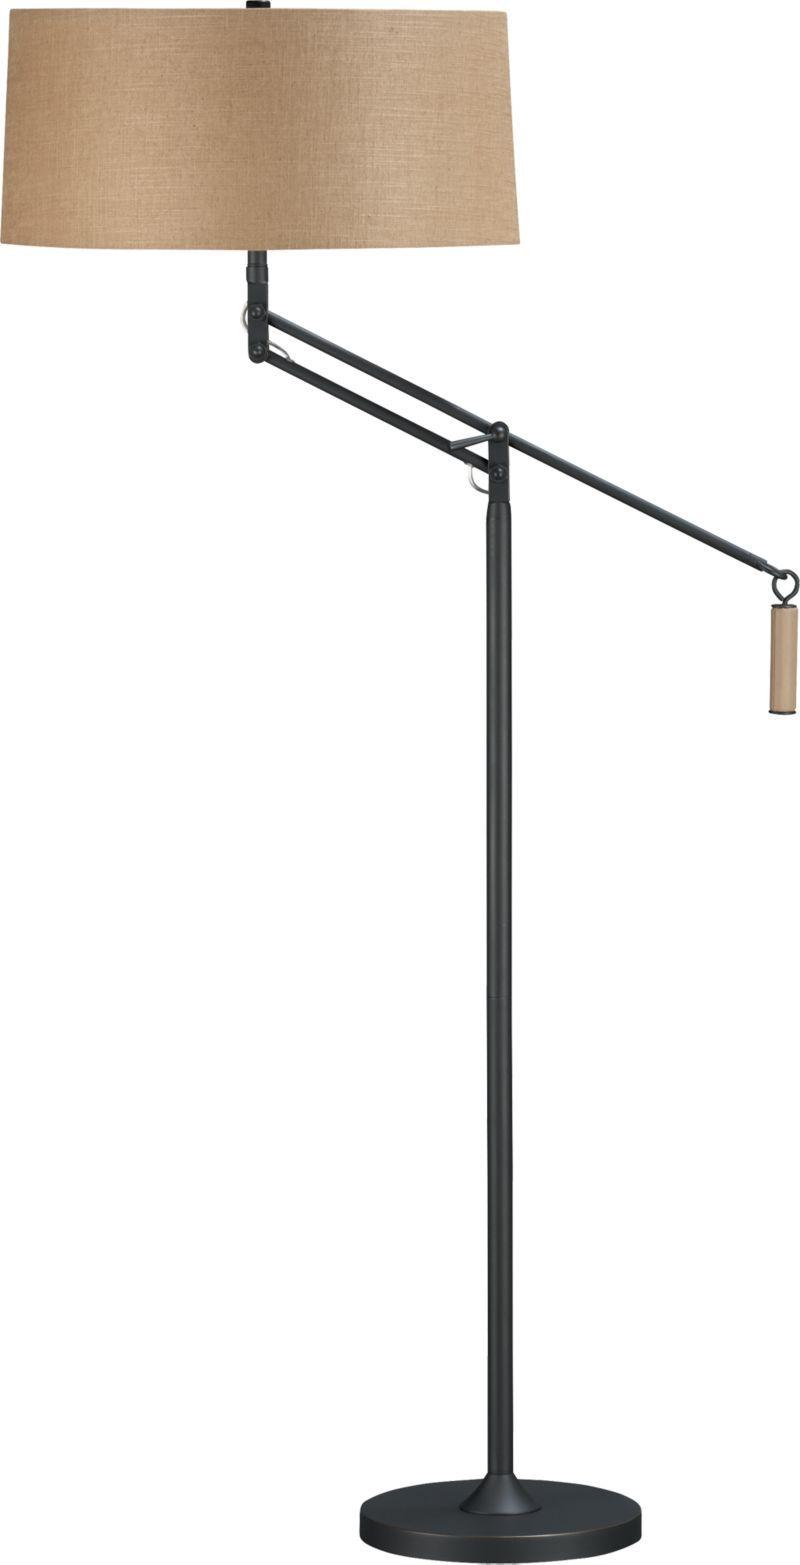 Autry Floor Lamp in Floor Lamps, Torchieres | Crate and ...